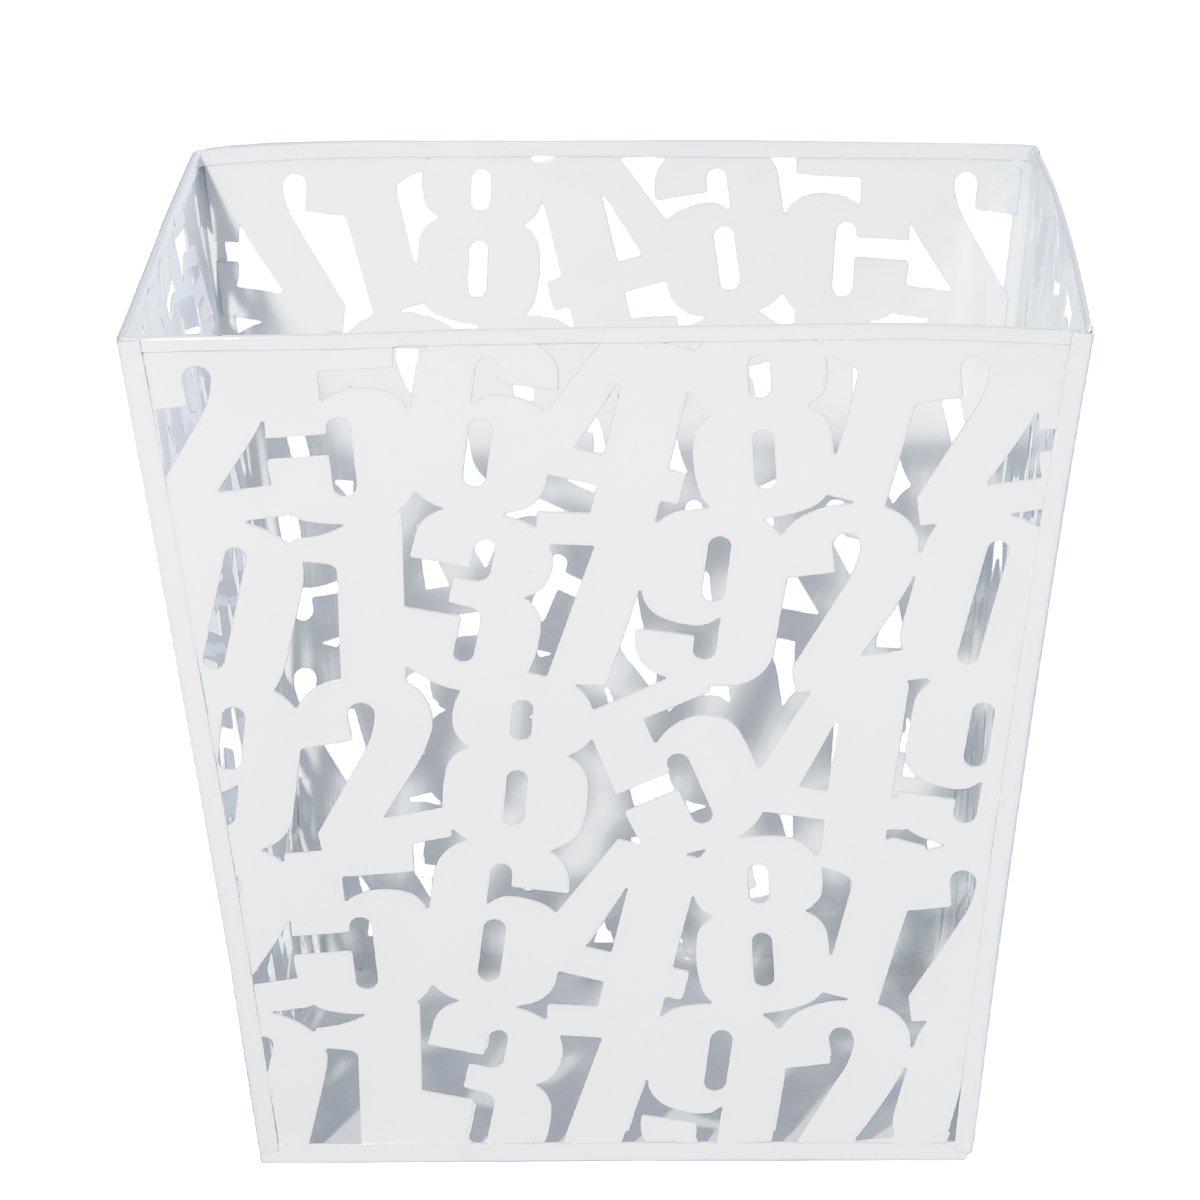 DXP Design Kreativ Papierkorb Mülleimer Papierkörbe Abfalleimer Abfall Korb Eckig Metall Weiß JZL03W günstig